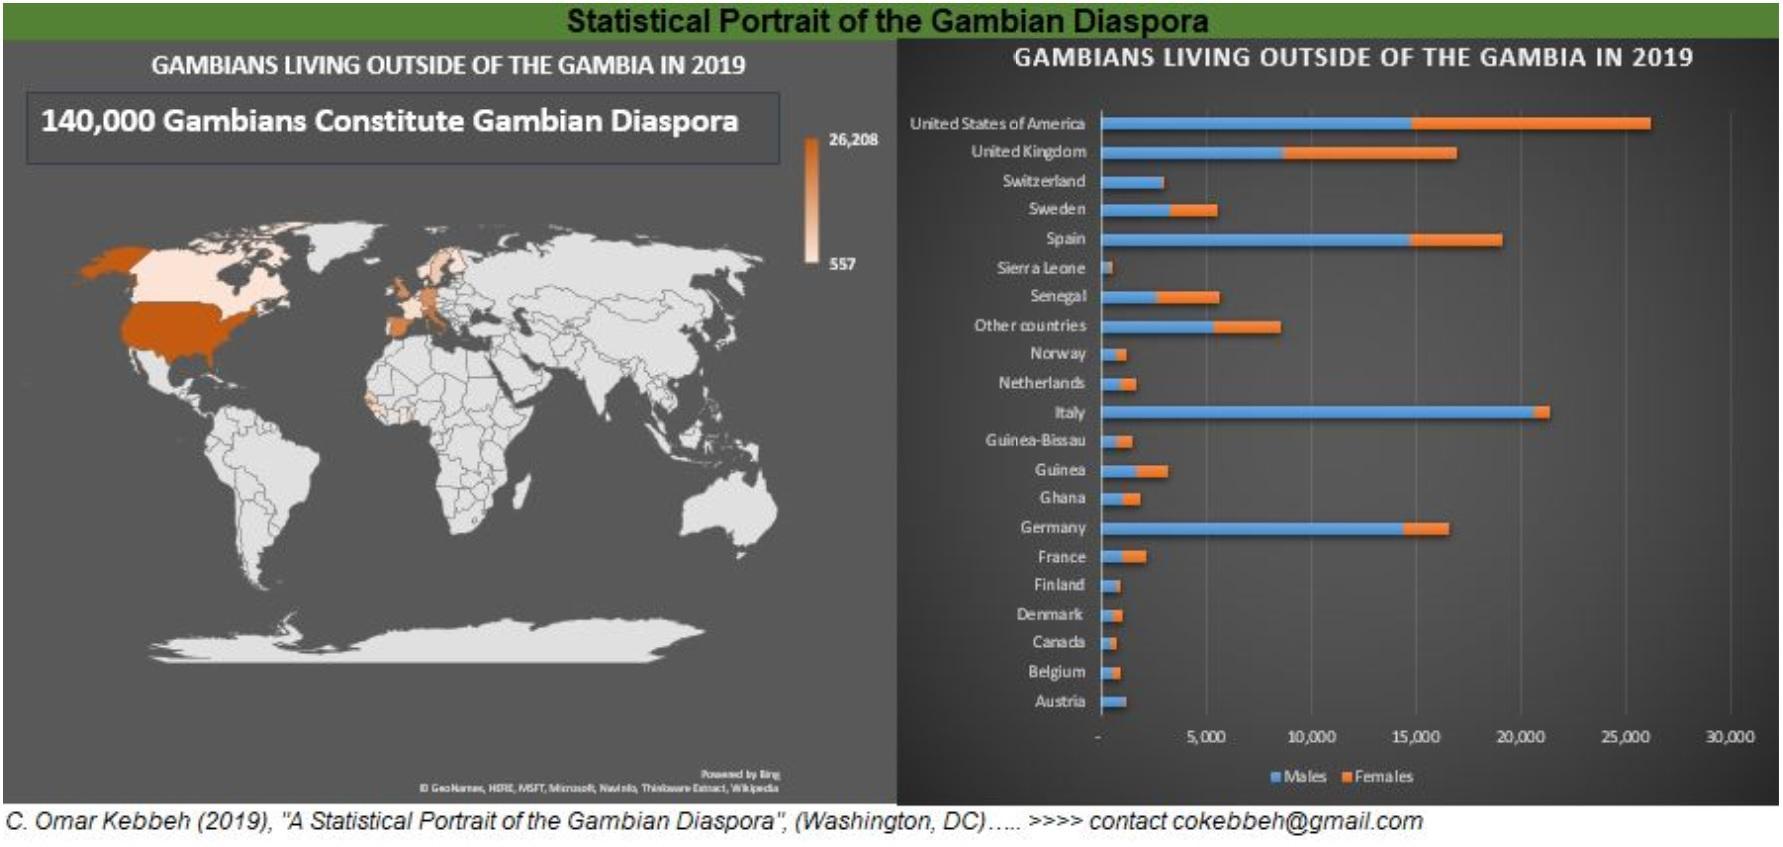 Gambian Diaspora Population by C. Omar Kebbeh